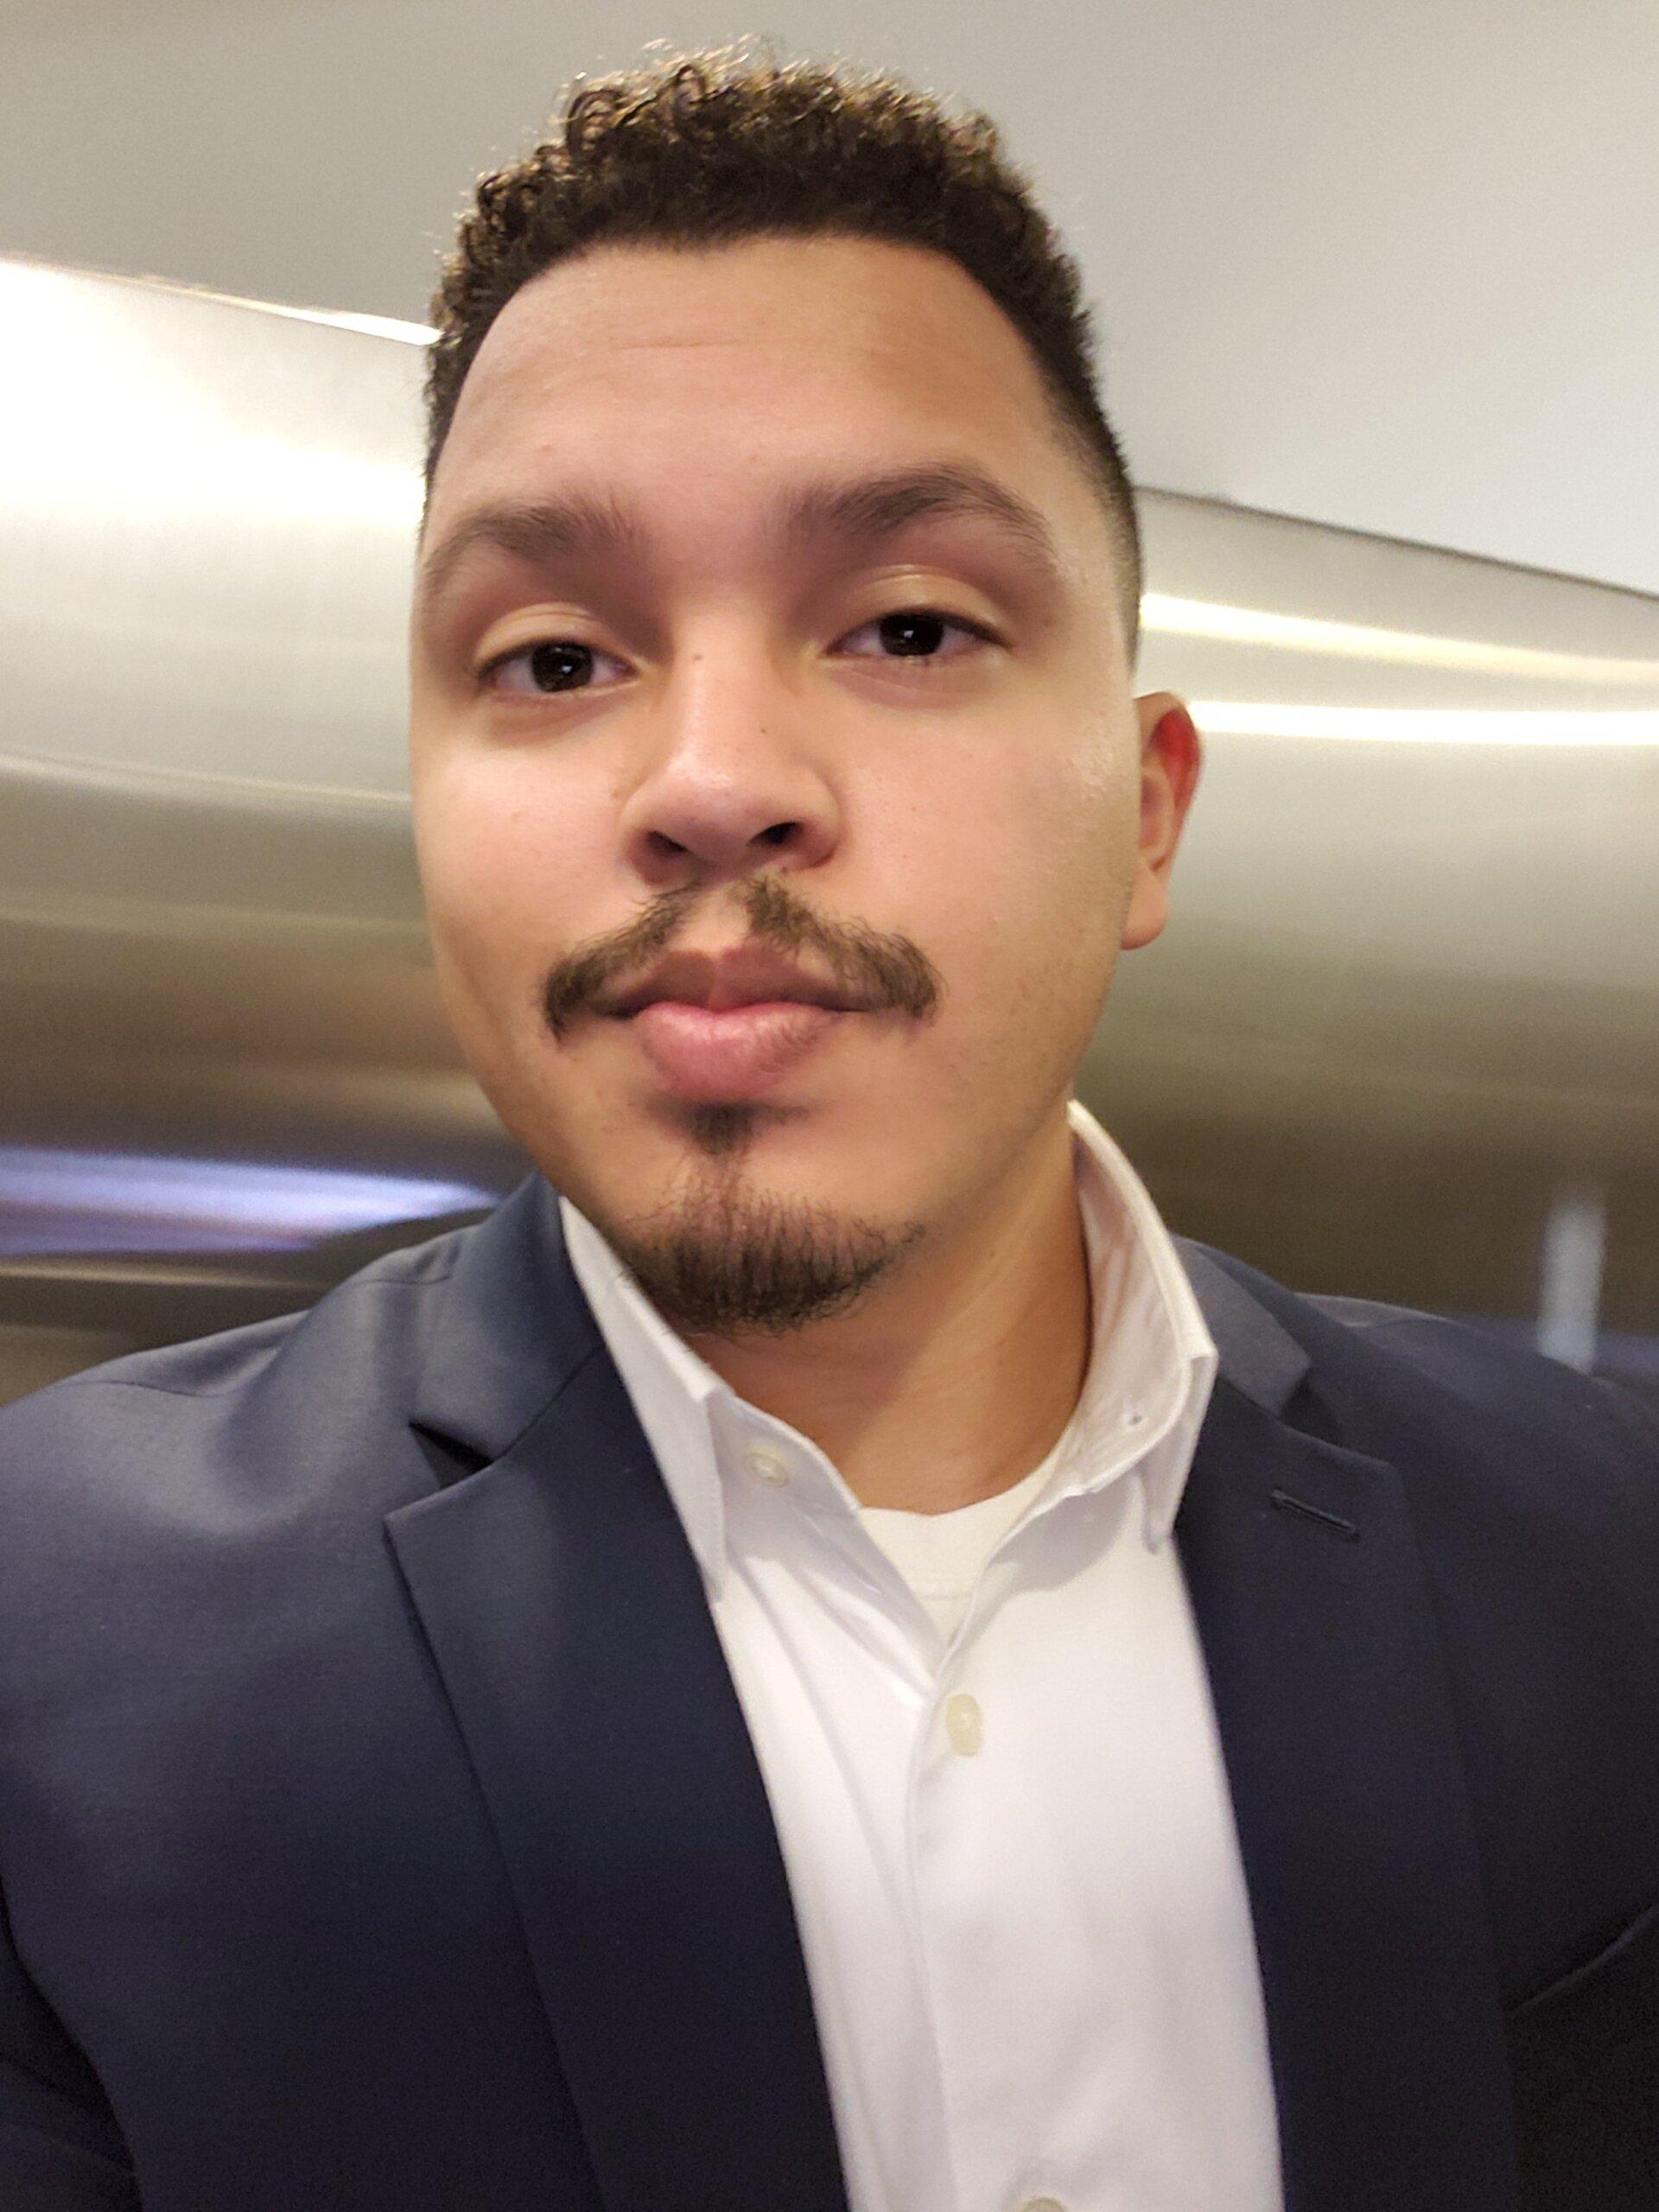 Edgar A. Servellon: ServiceNow Certified Implementation Specialist – Human Resources (CIS-HR)